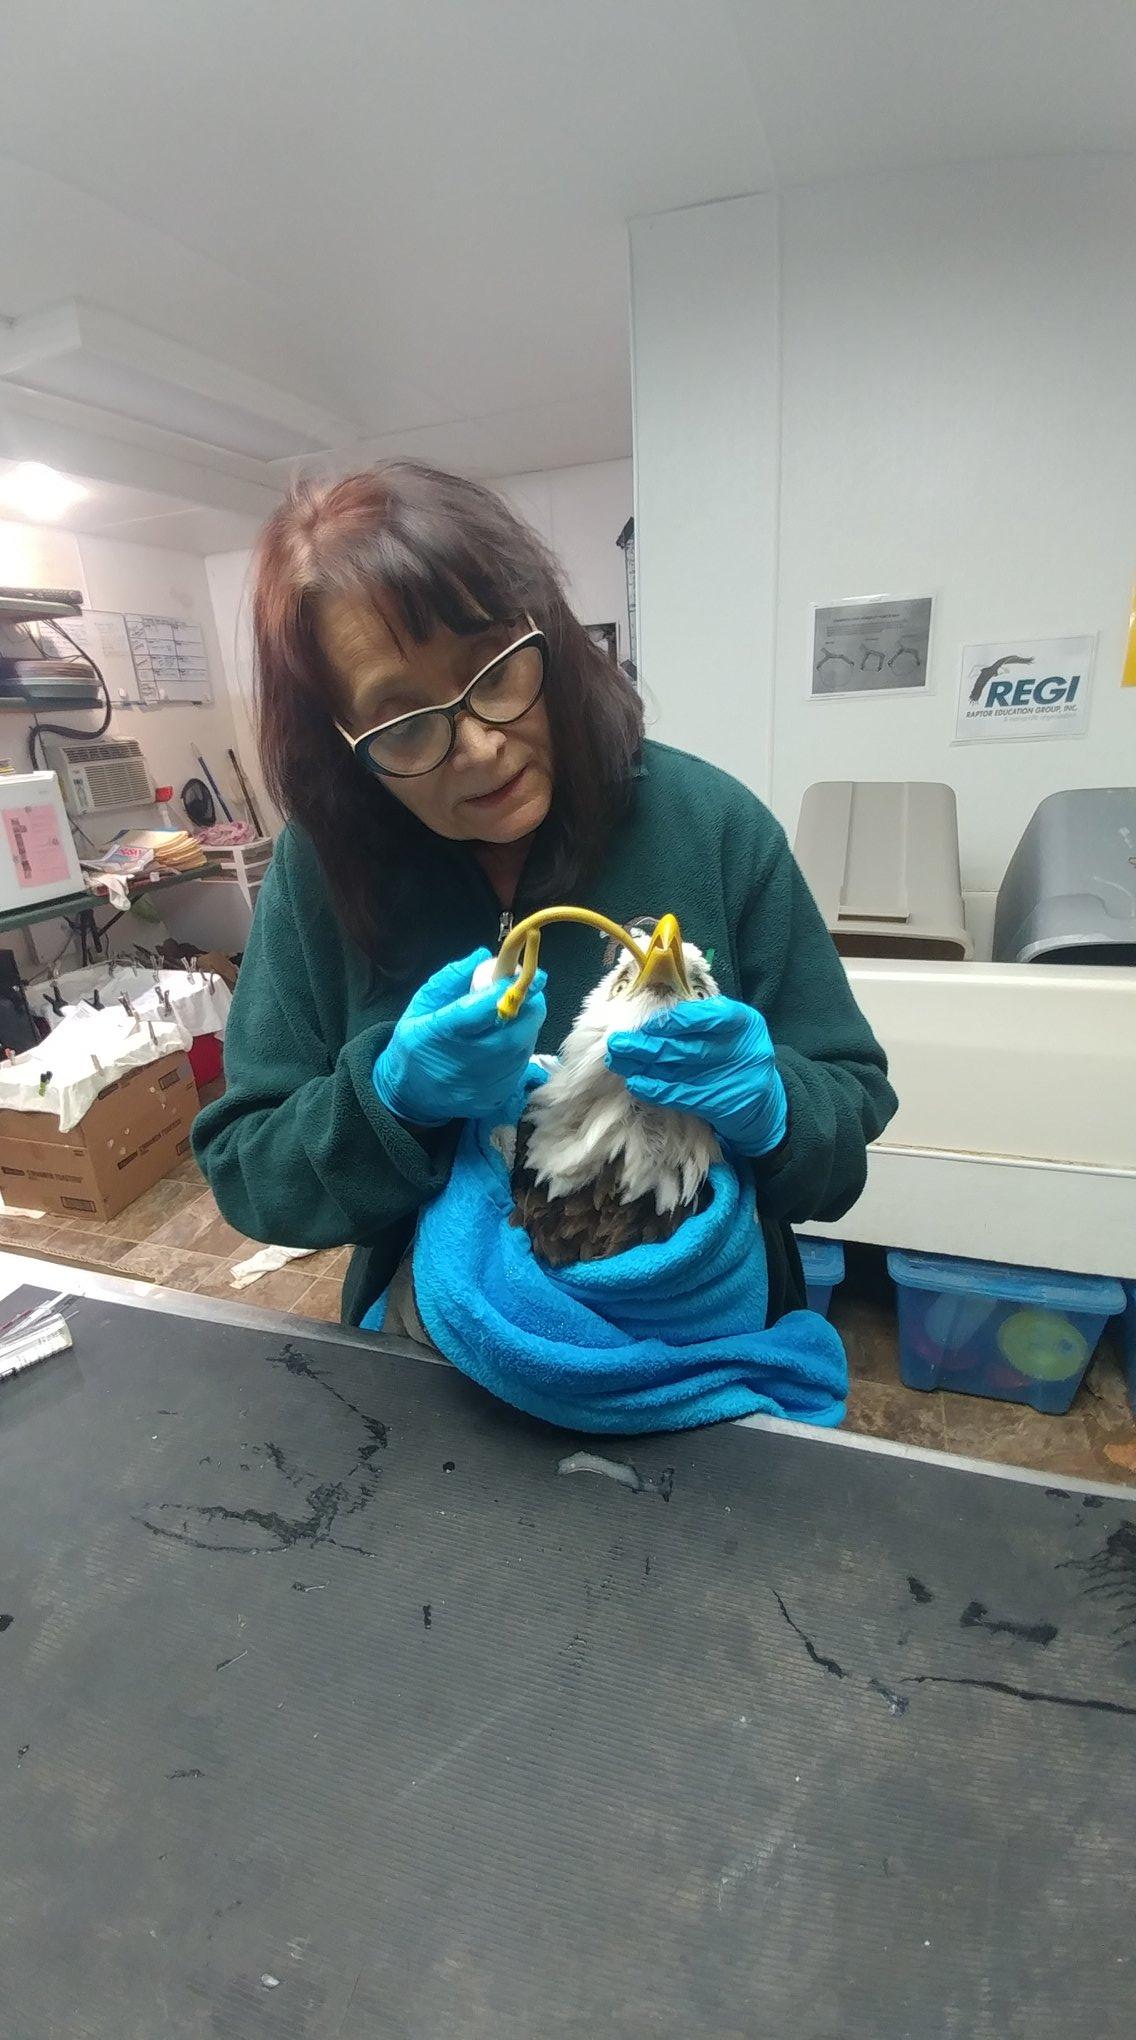 Tube feeding liquid food for the starving eagle.